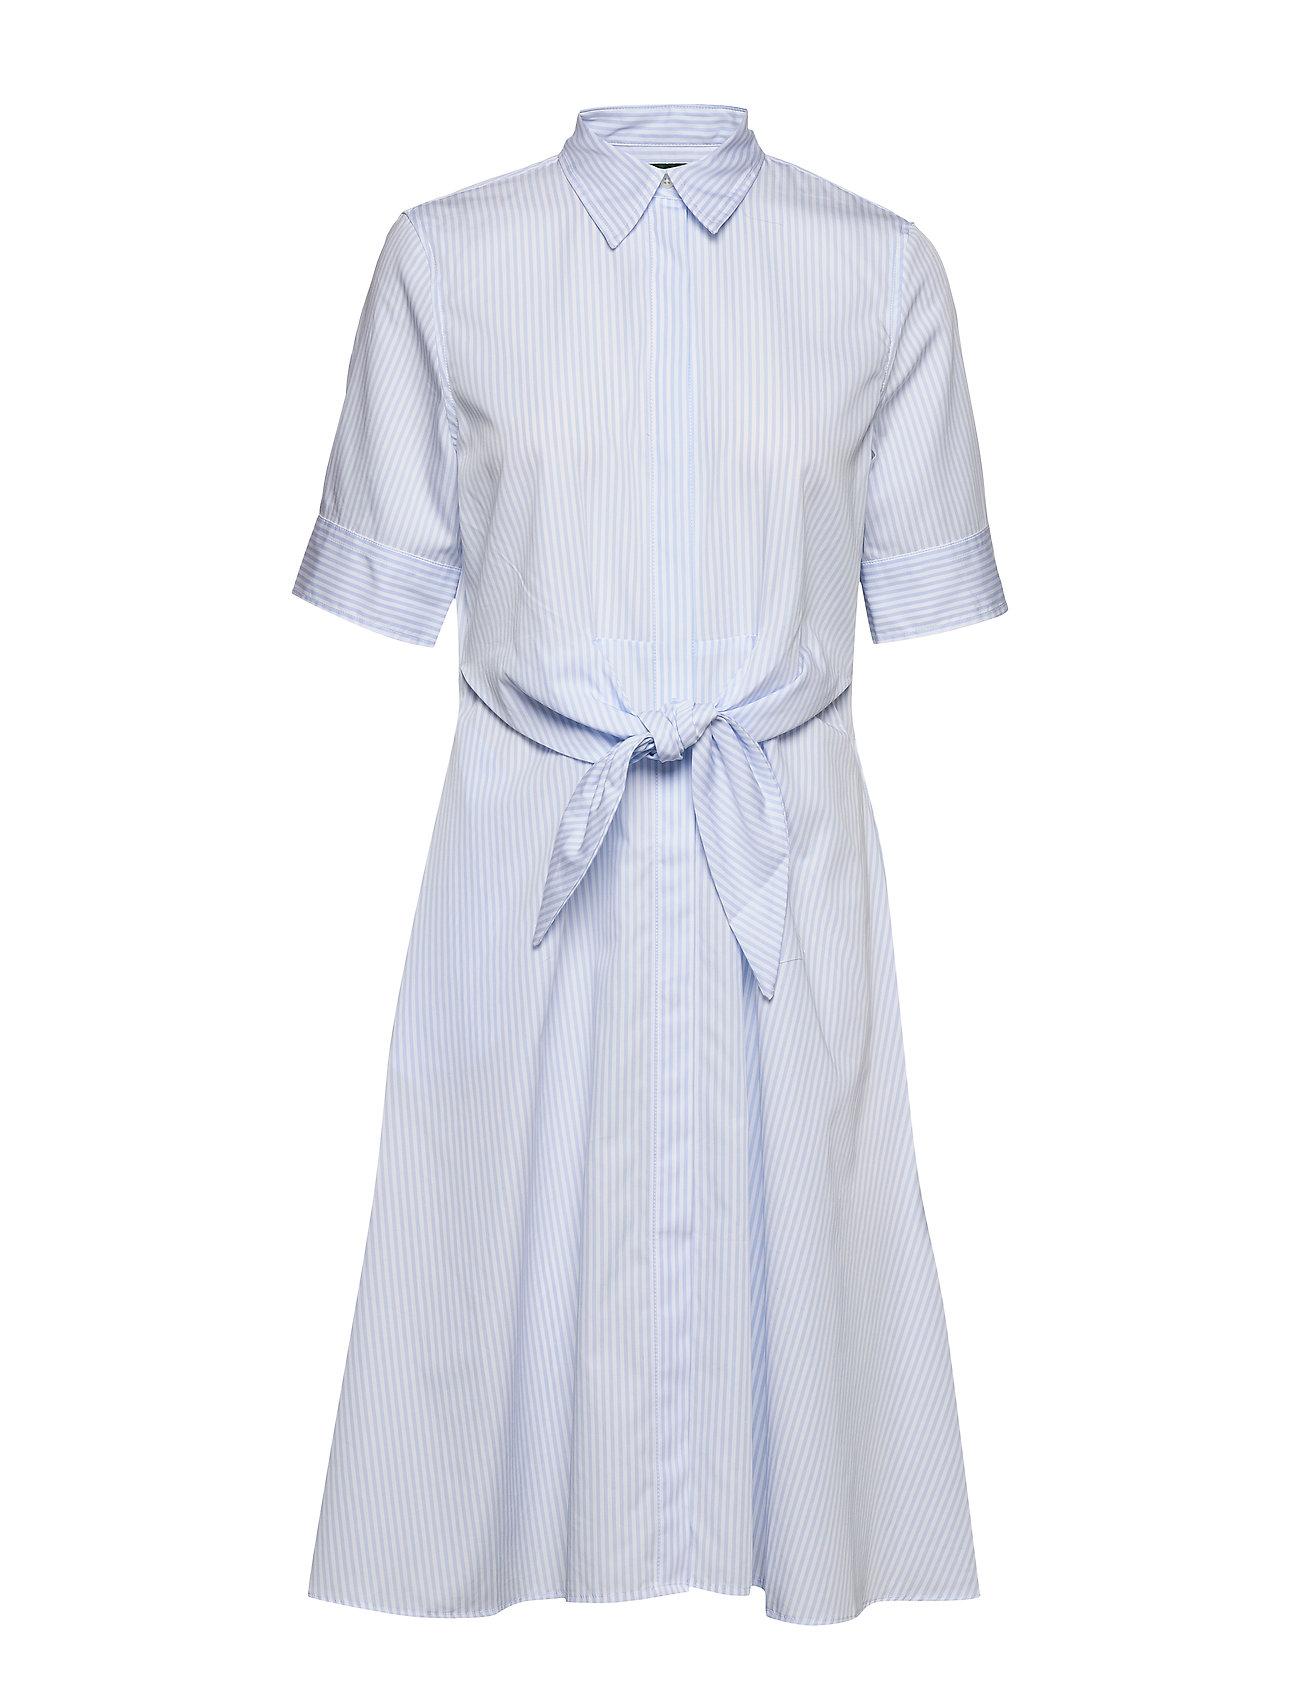 Lauren Ralph Lauren Striped Cotton Shirtdress - BLUE/WHITE